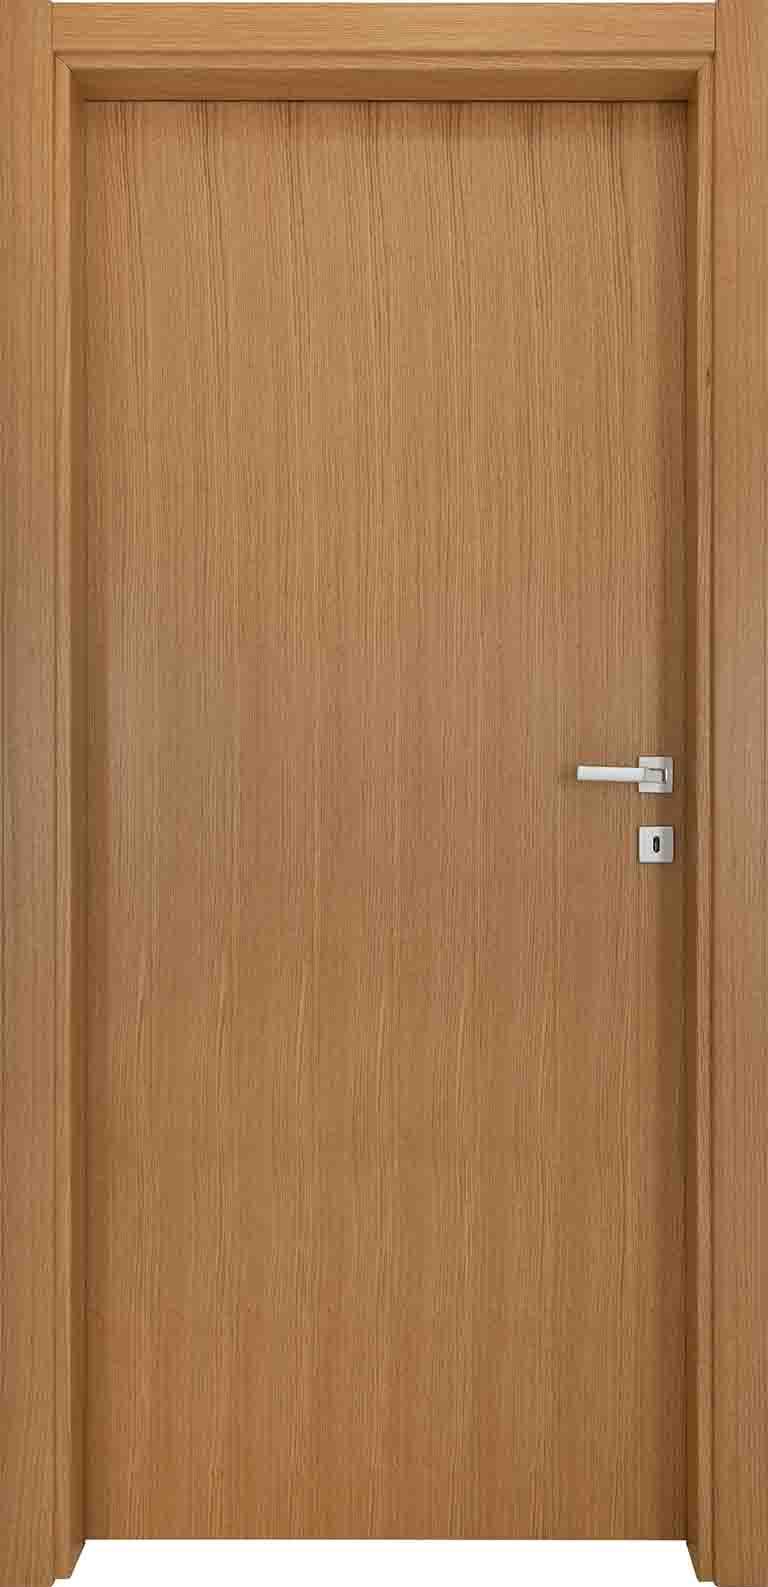 protuprovalna vrata forlux furnir natur